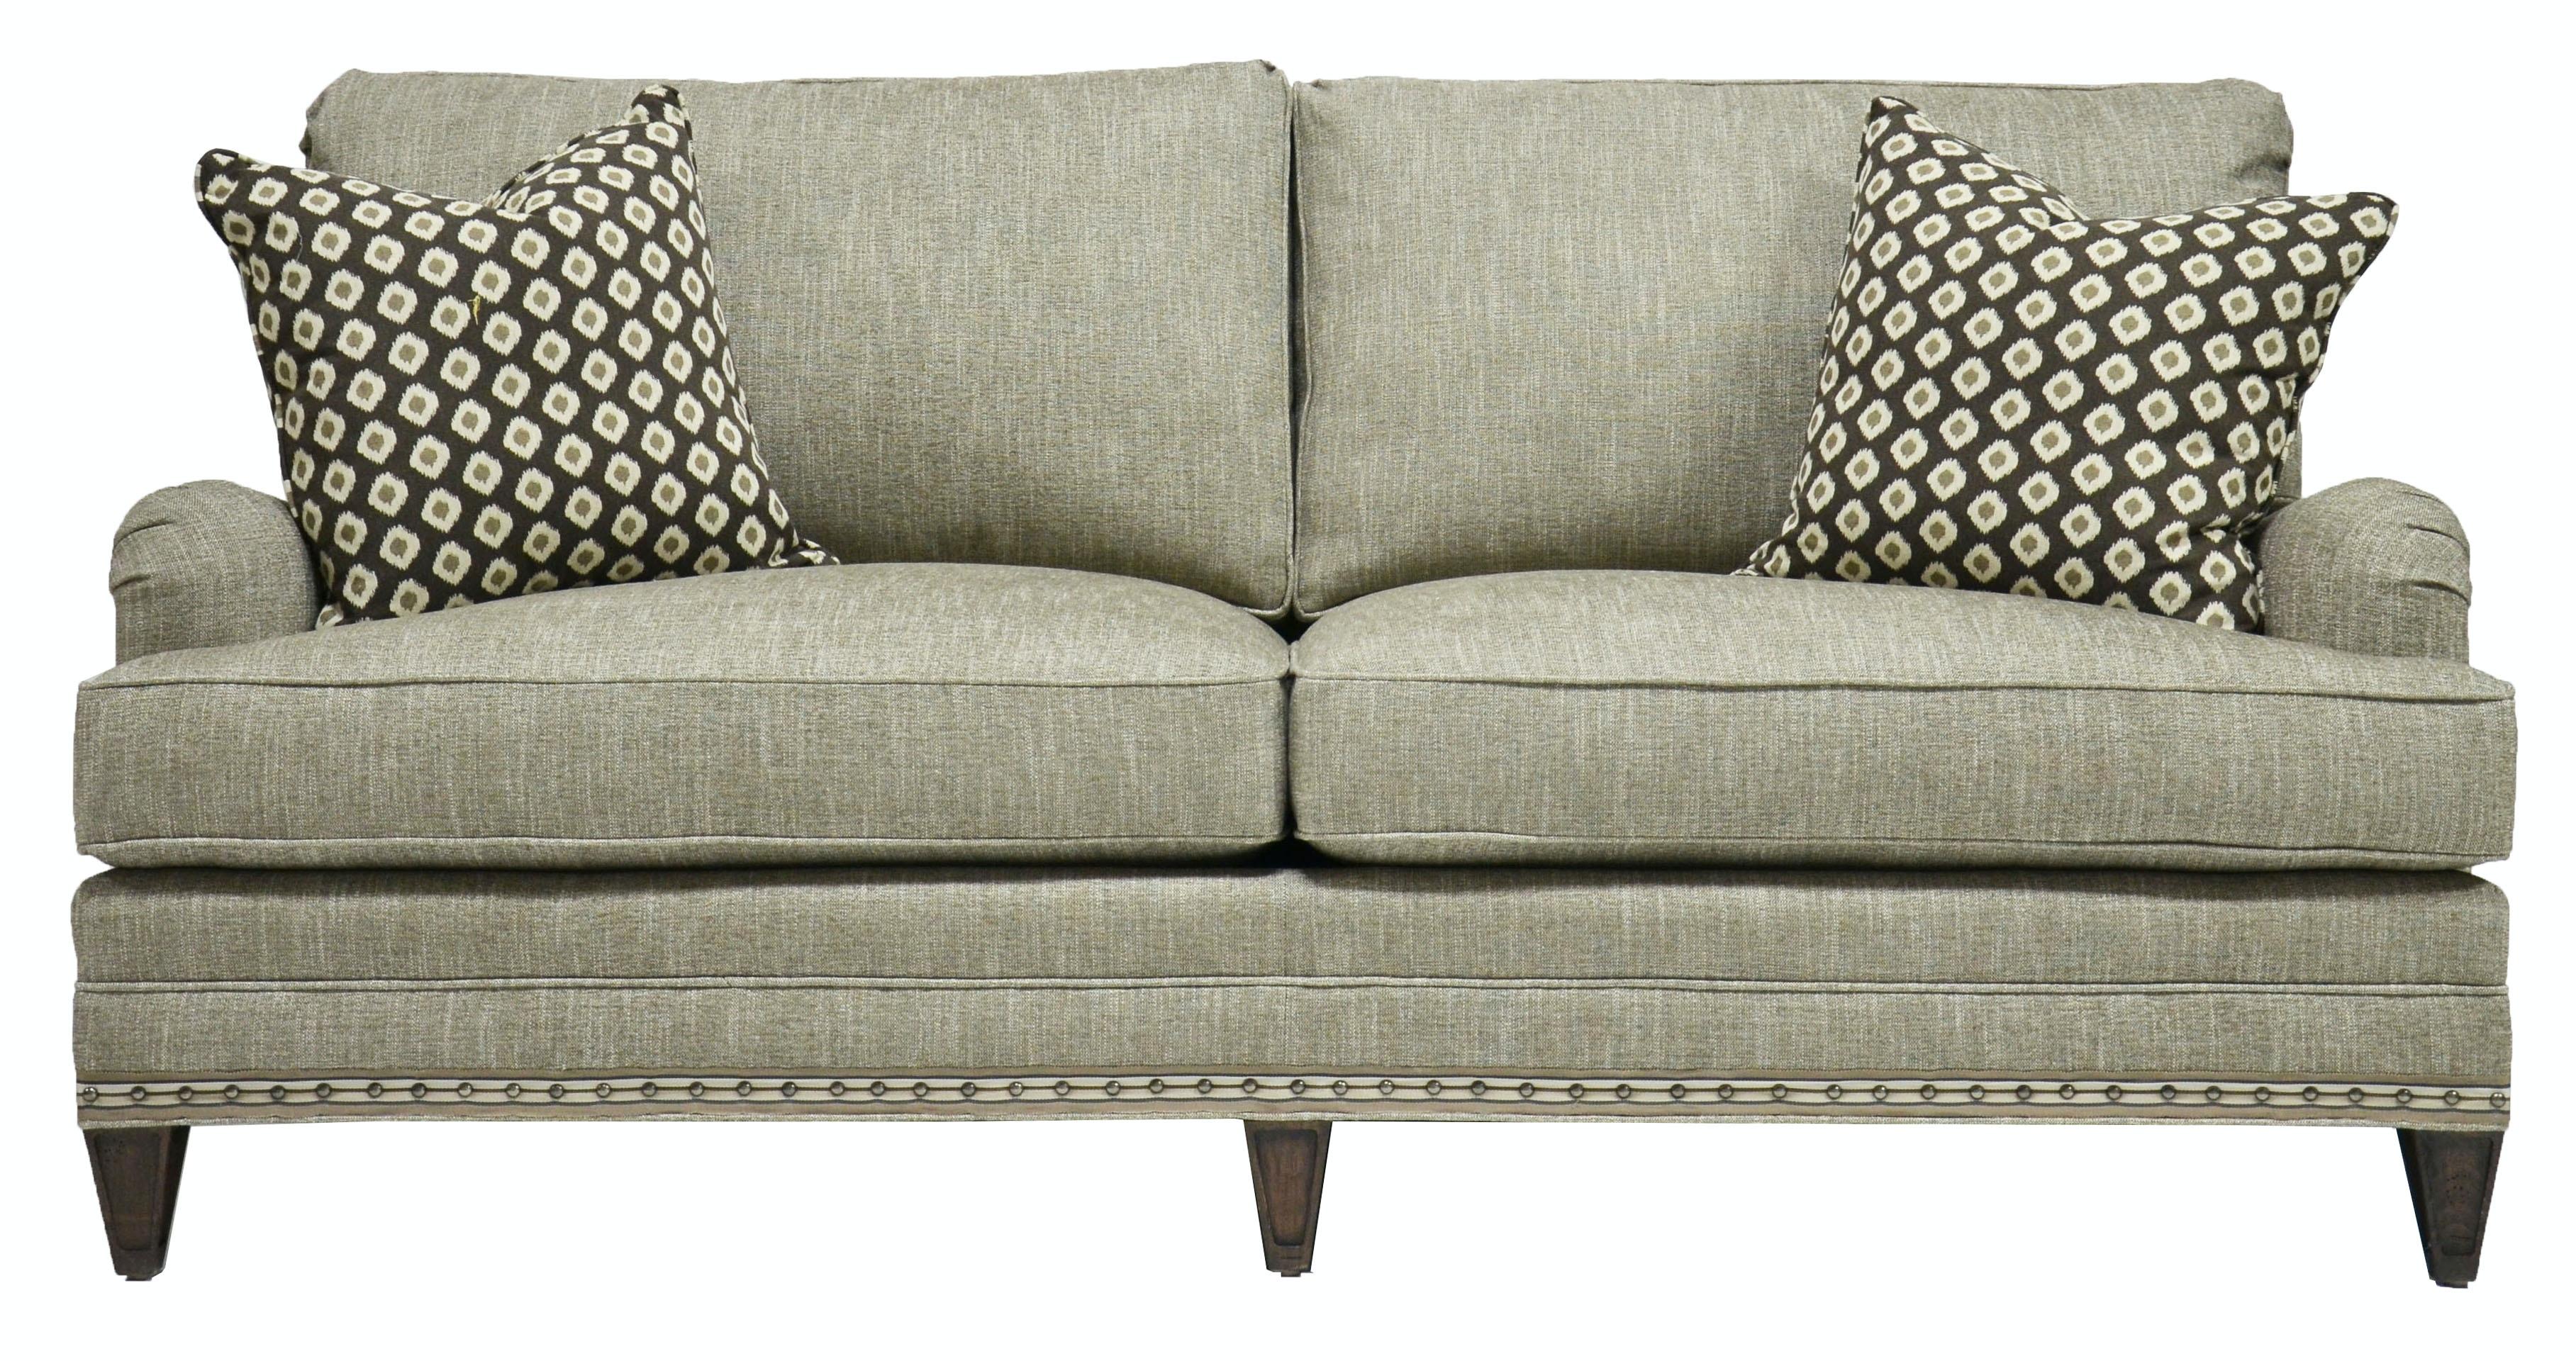 Vanguard Winslow Sofa V295 S - Hamilton sofa and Leather Gallery